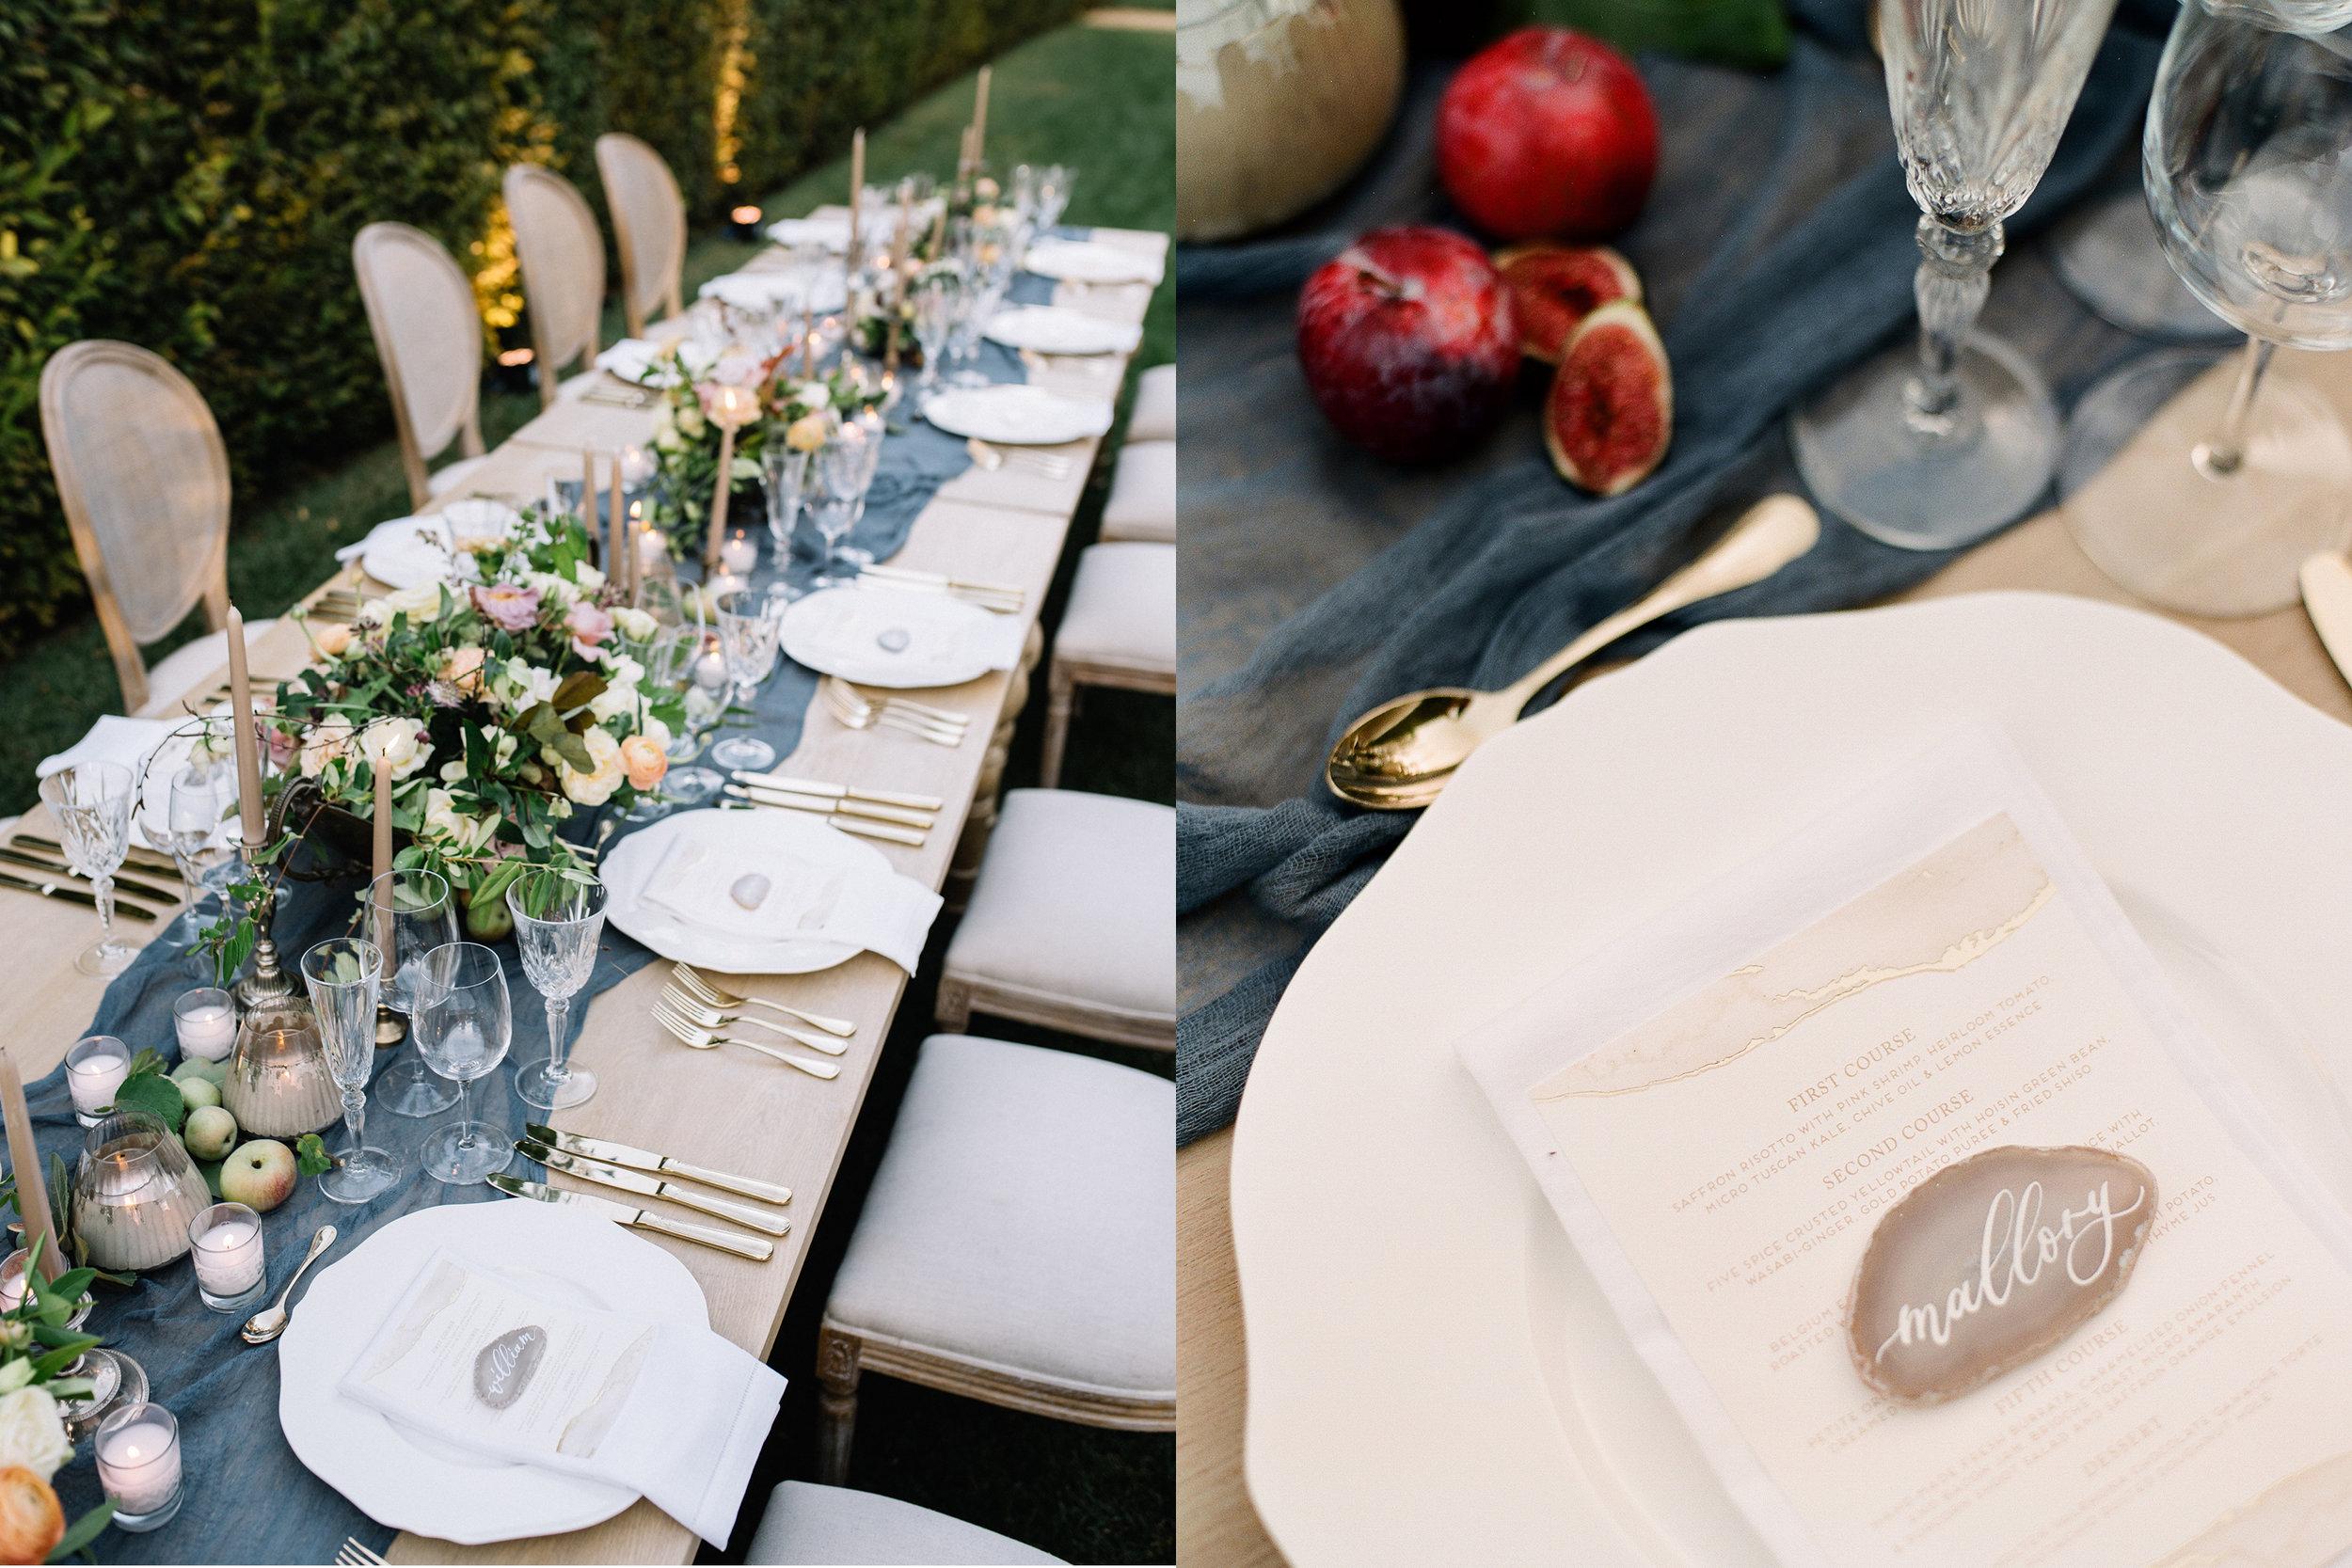 santa-barbara-elopement-elope-wedding-planner-planning-coordinator-day-of-intimate-event-design-kestrel-park-santa-ynez-english-country-estate-garden-castle (29).jpg